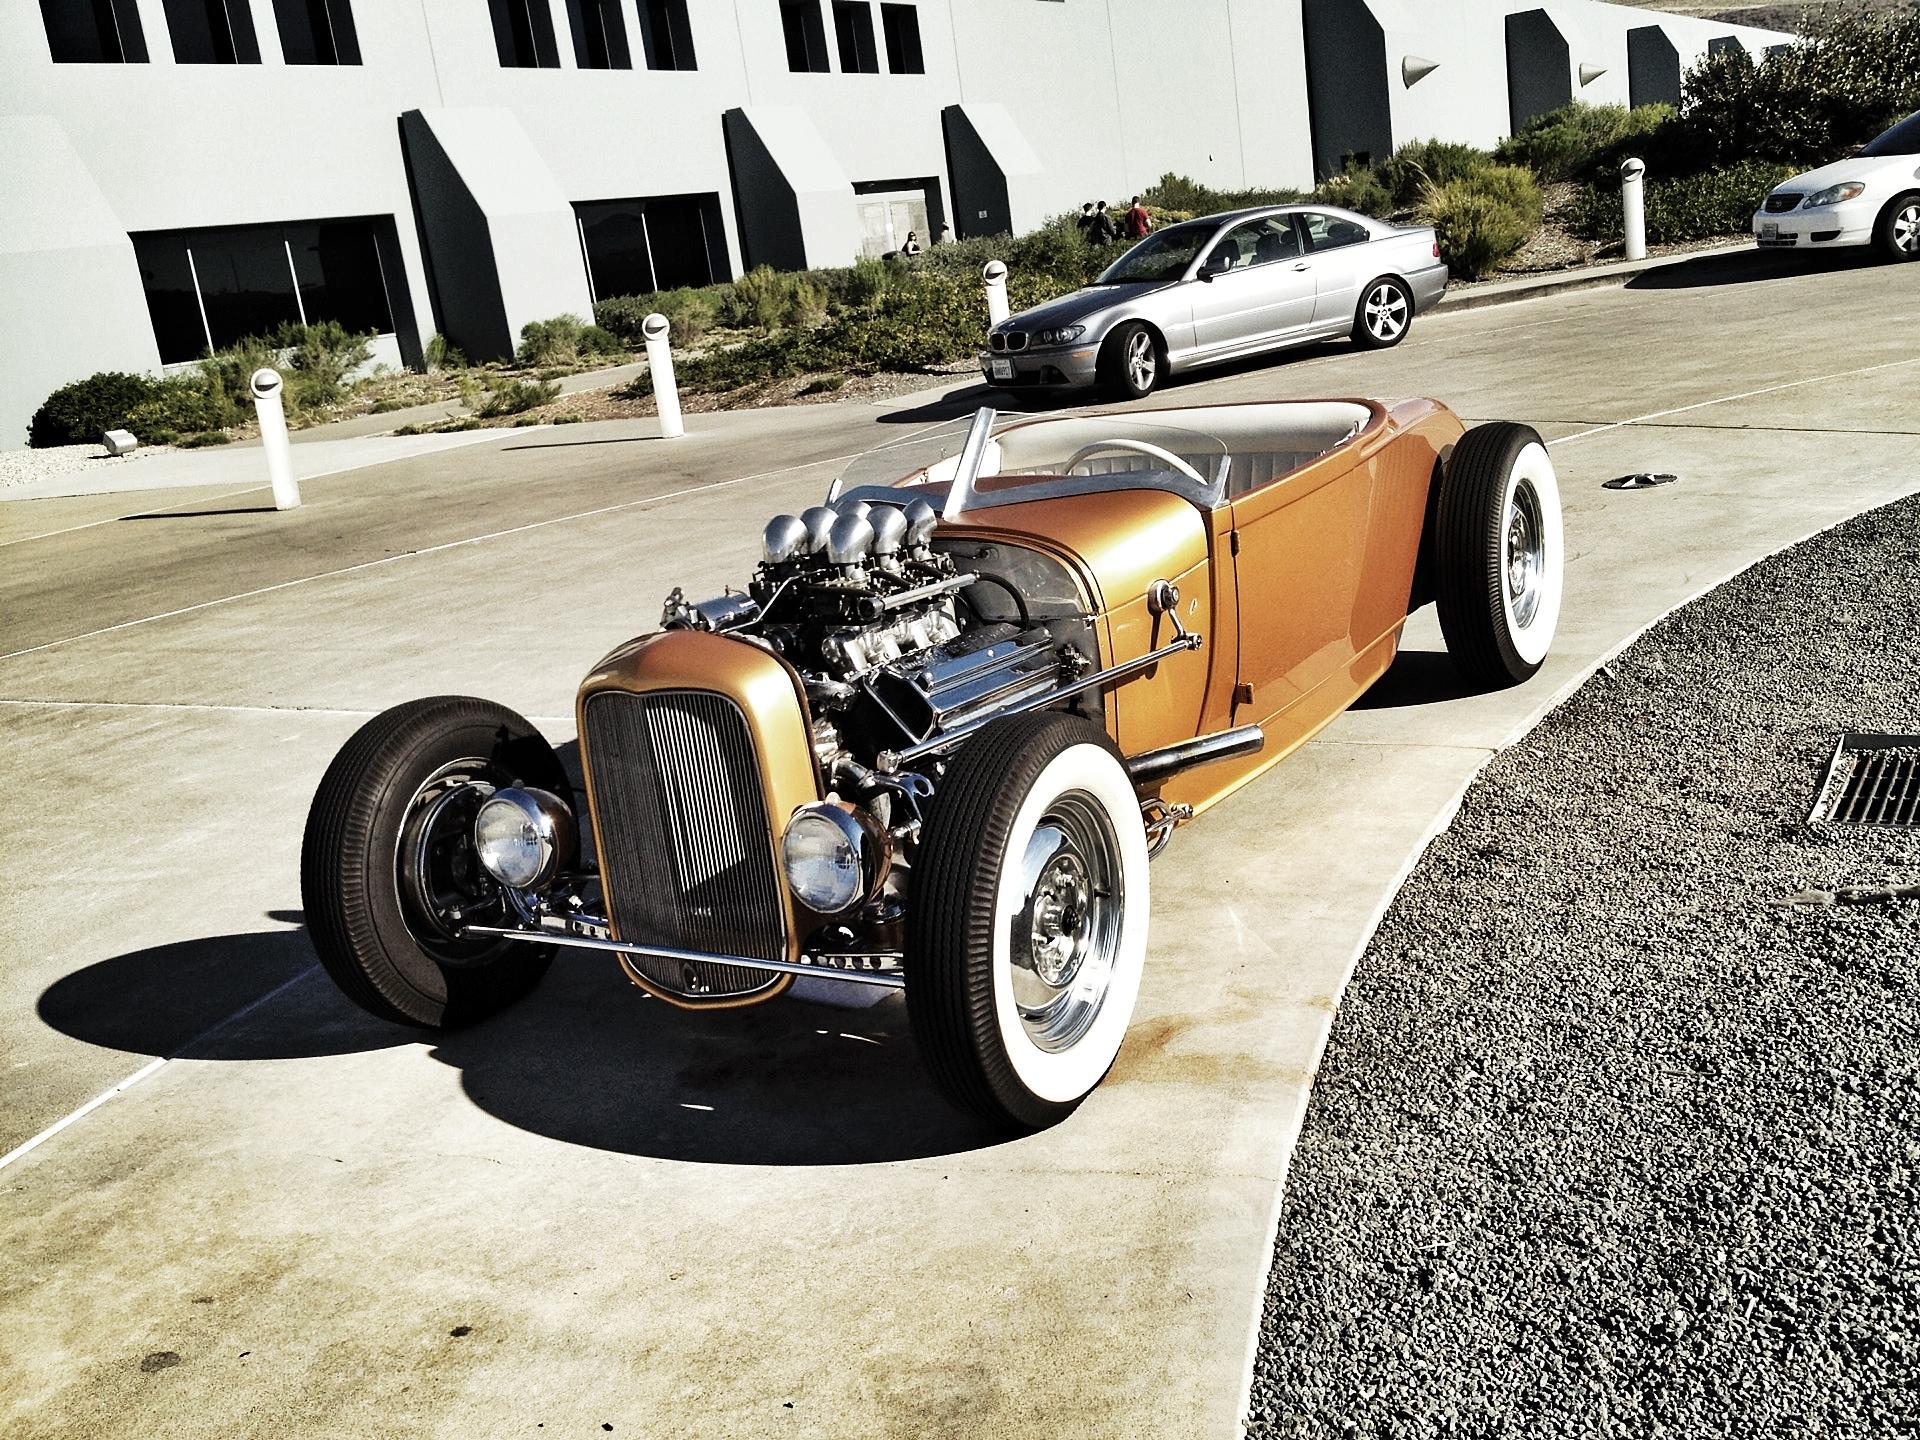 Custom Hot Rod by Oakley Designer, Nick Garfias.